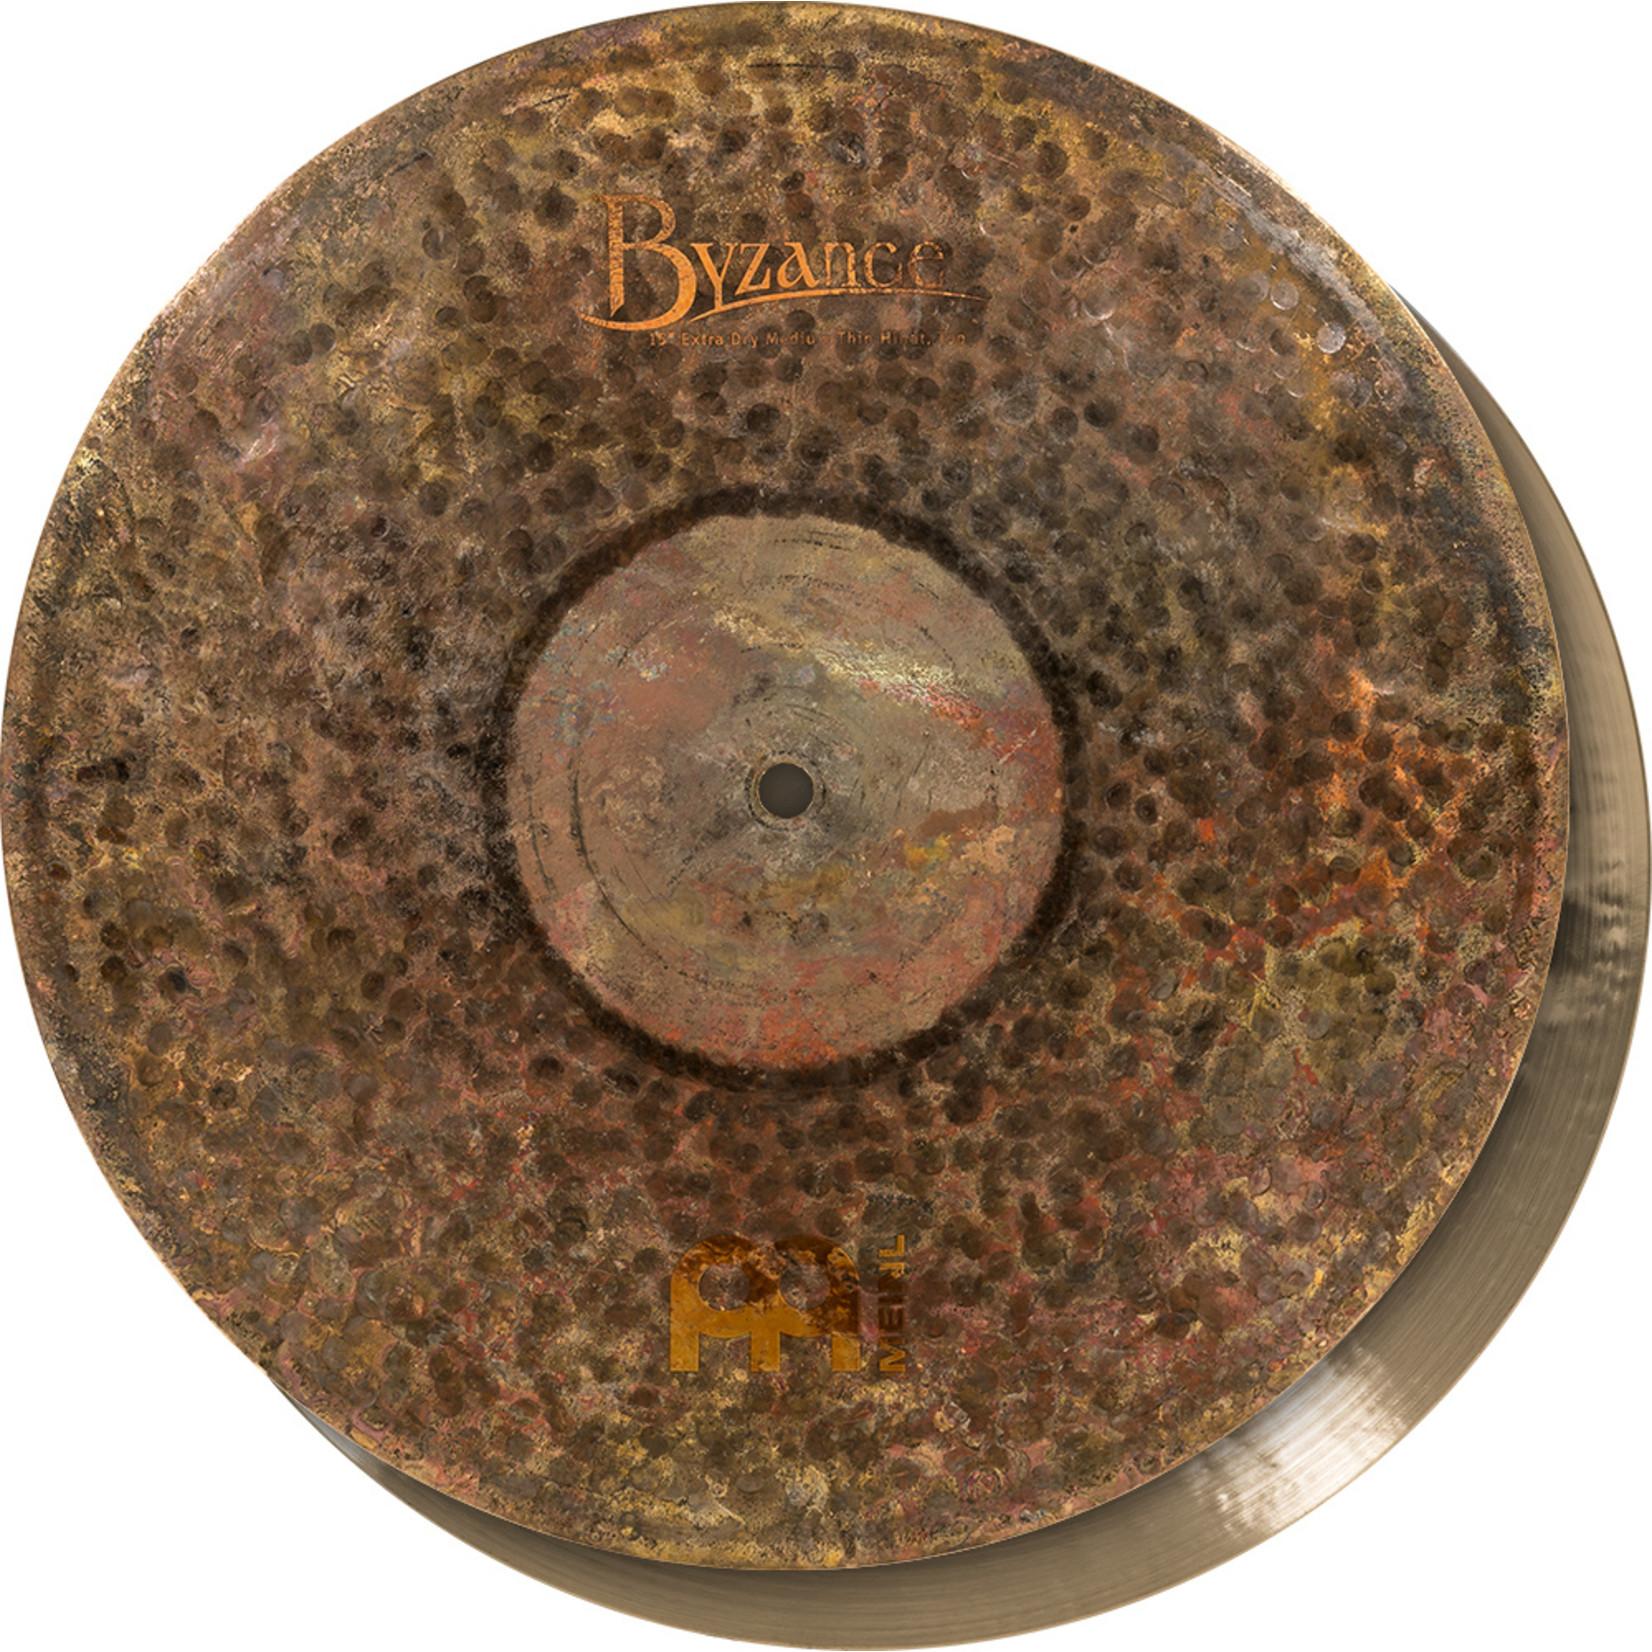 Meinl Meinl Byzance 15'' Extra Dry Medium Thin Hihat, pair